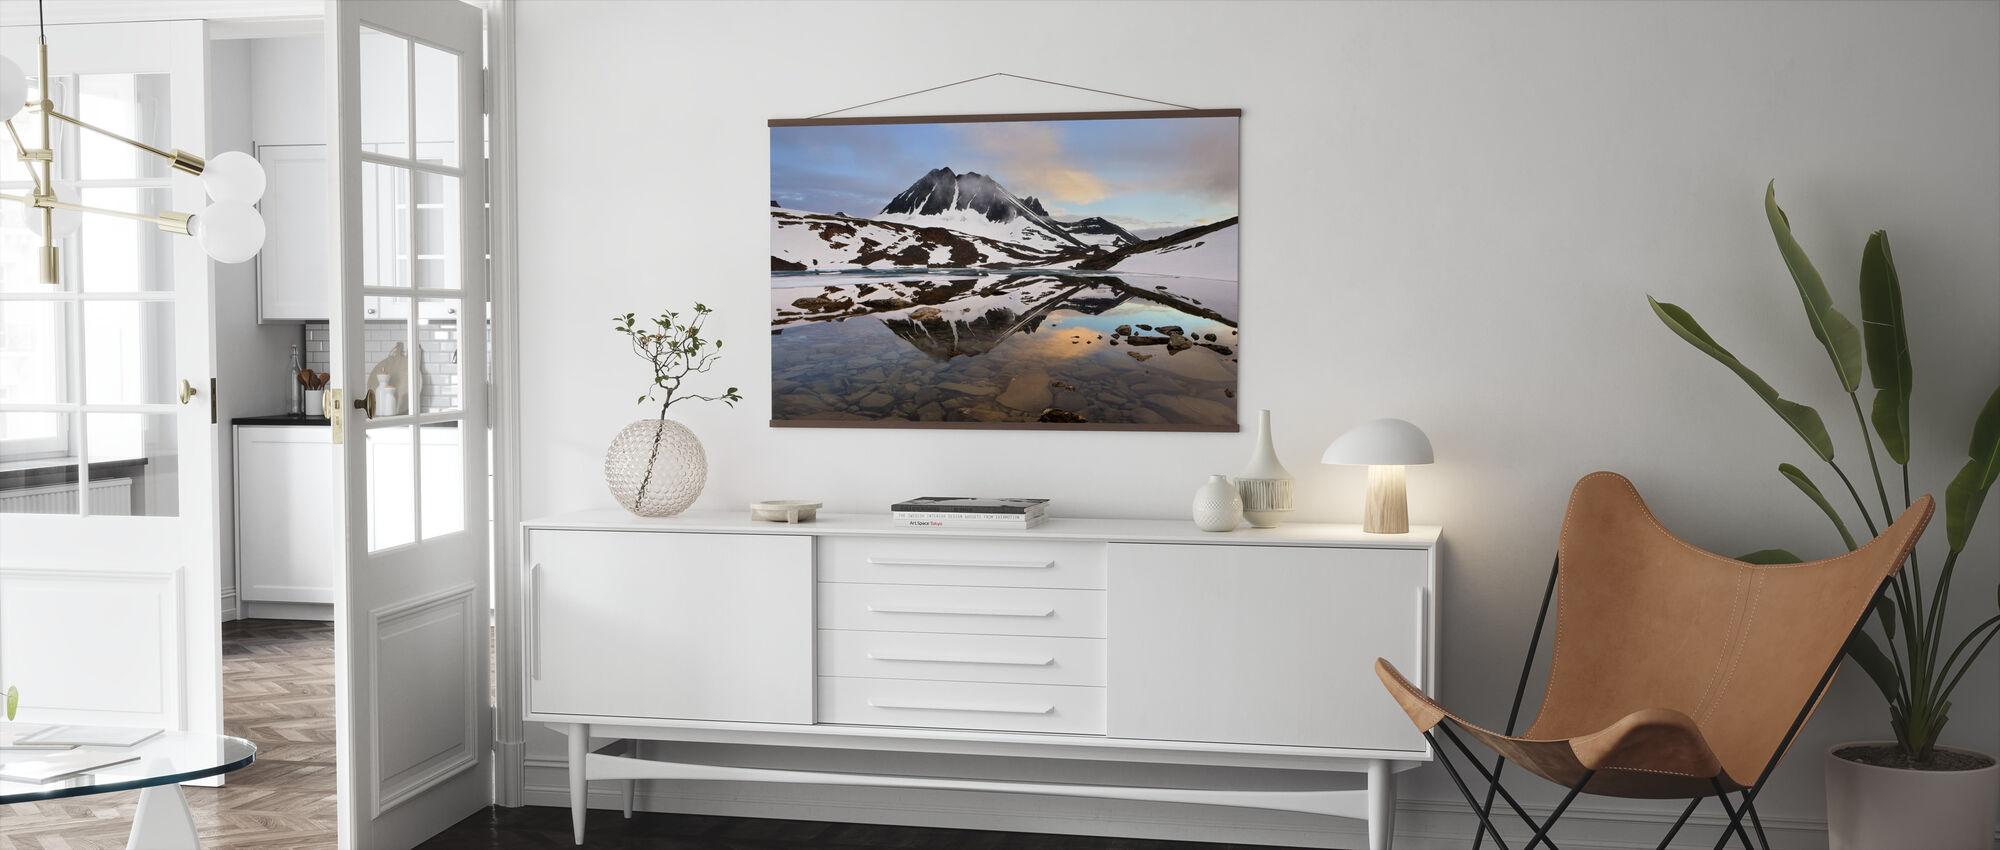 Lapland Glacial, Sweden - Poster - Living Room